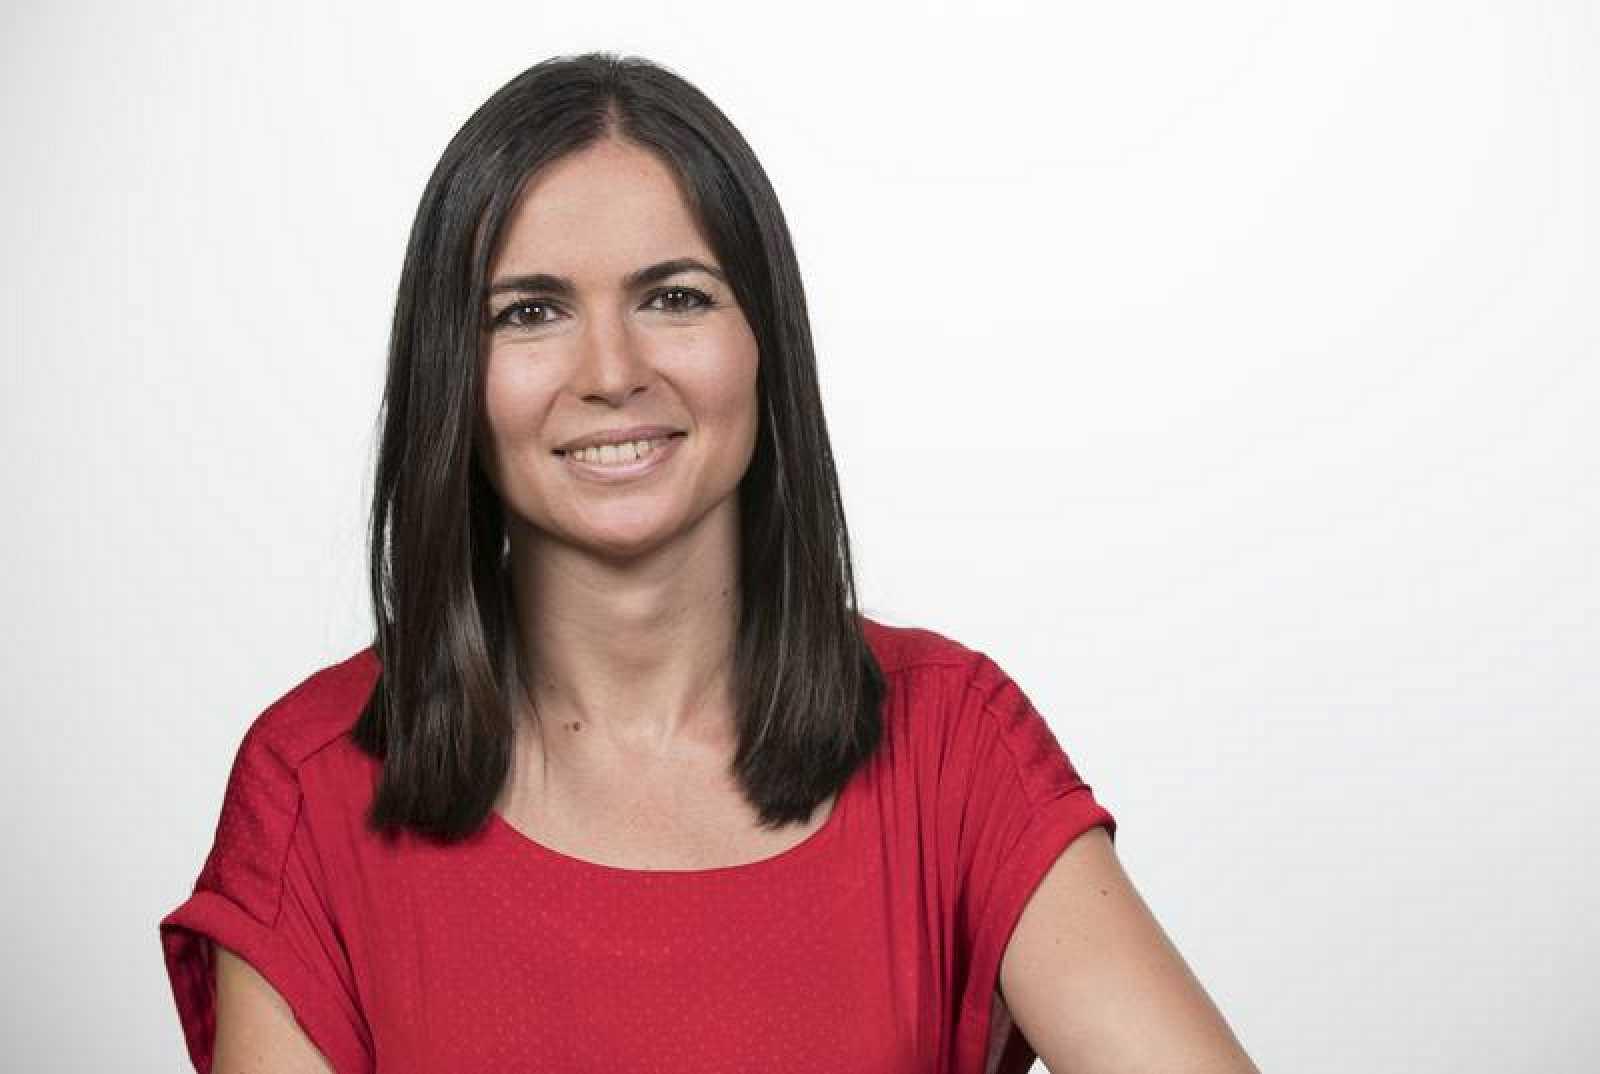 Cristina Olea, corresponsal de RNE en Washington